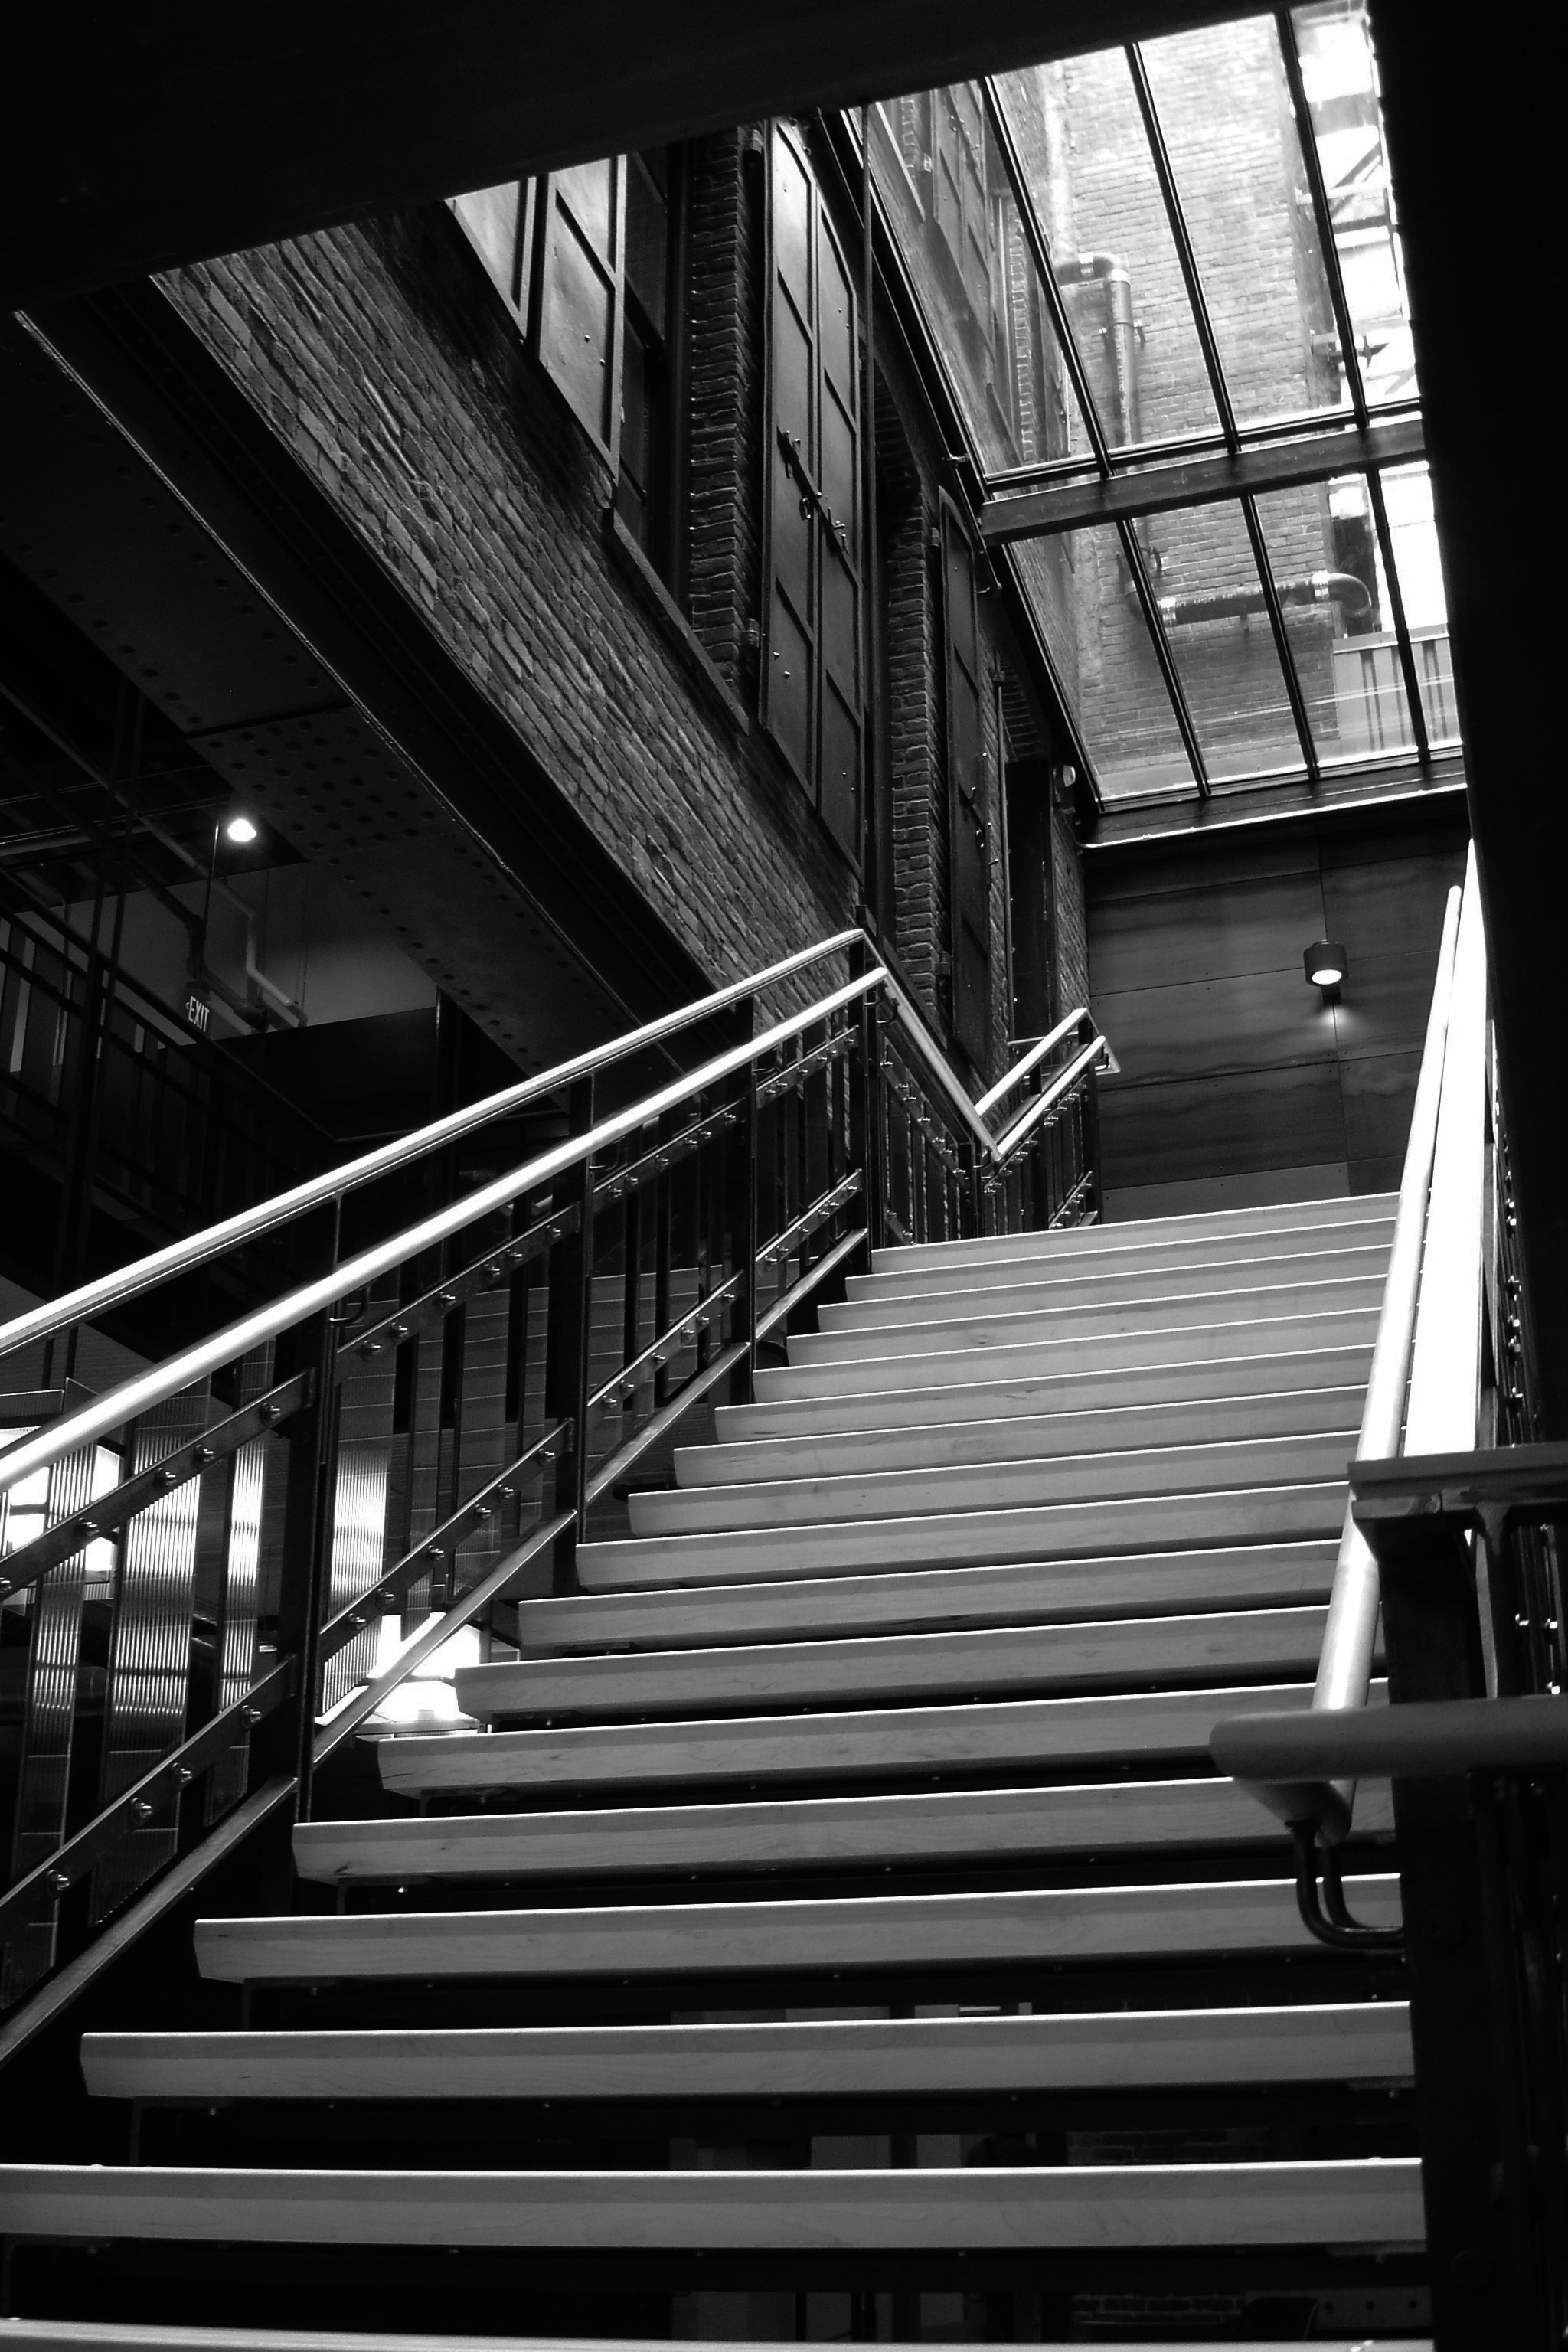 Portland - White Stag Building edit.jpg